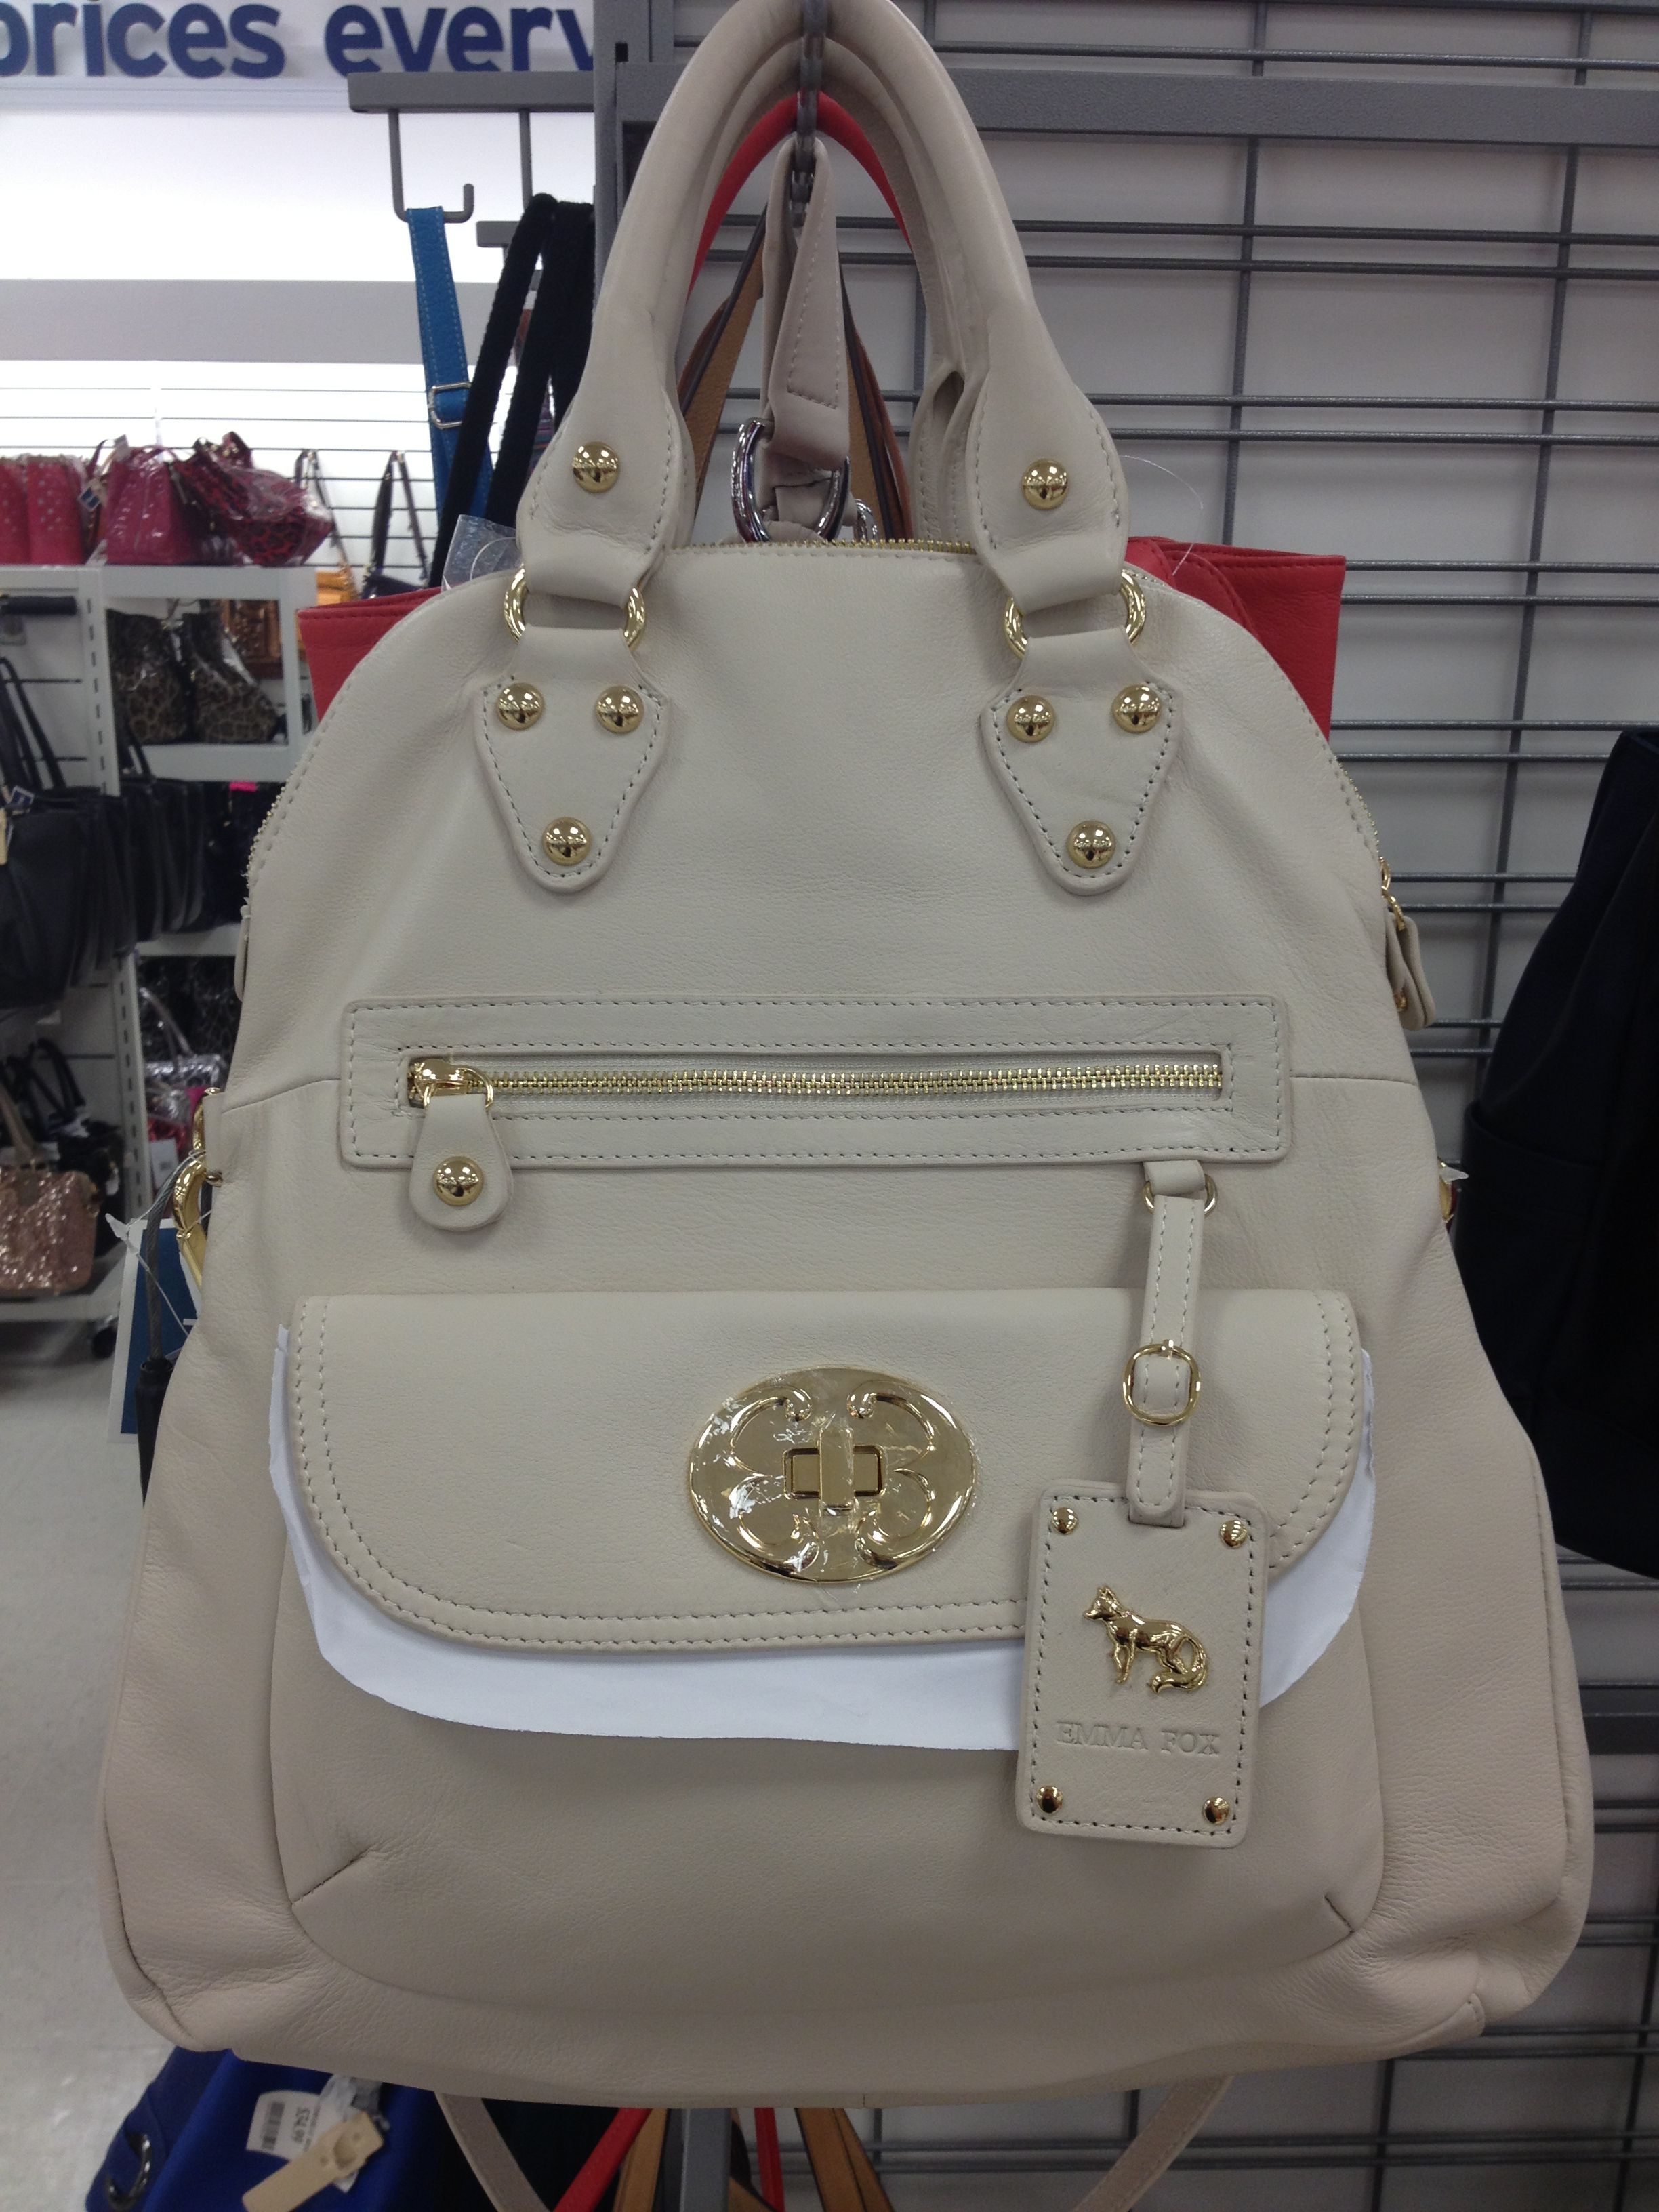 I Am So Over Michael Kors Bags Just Want An Emma Fox Bag